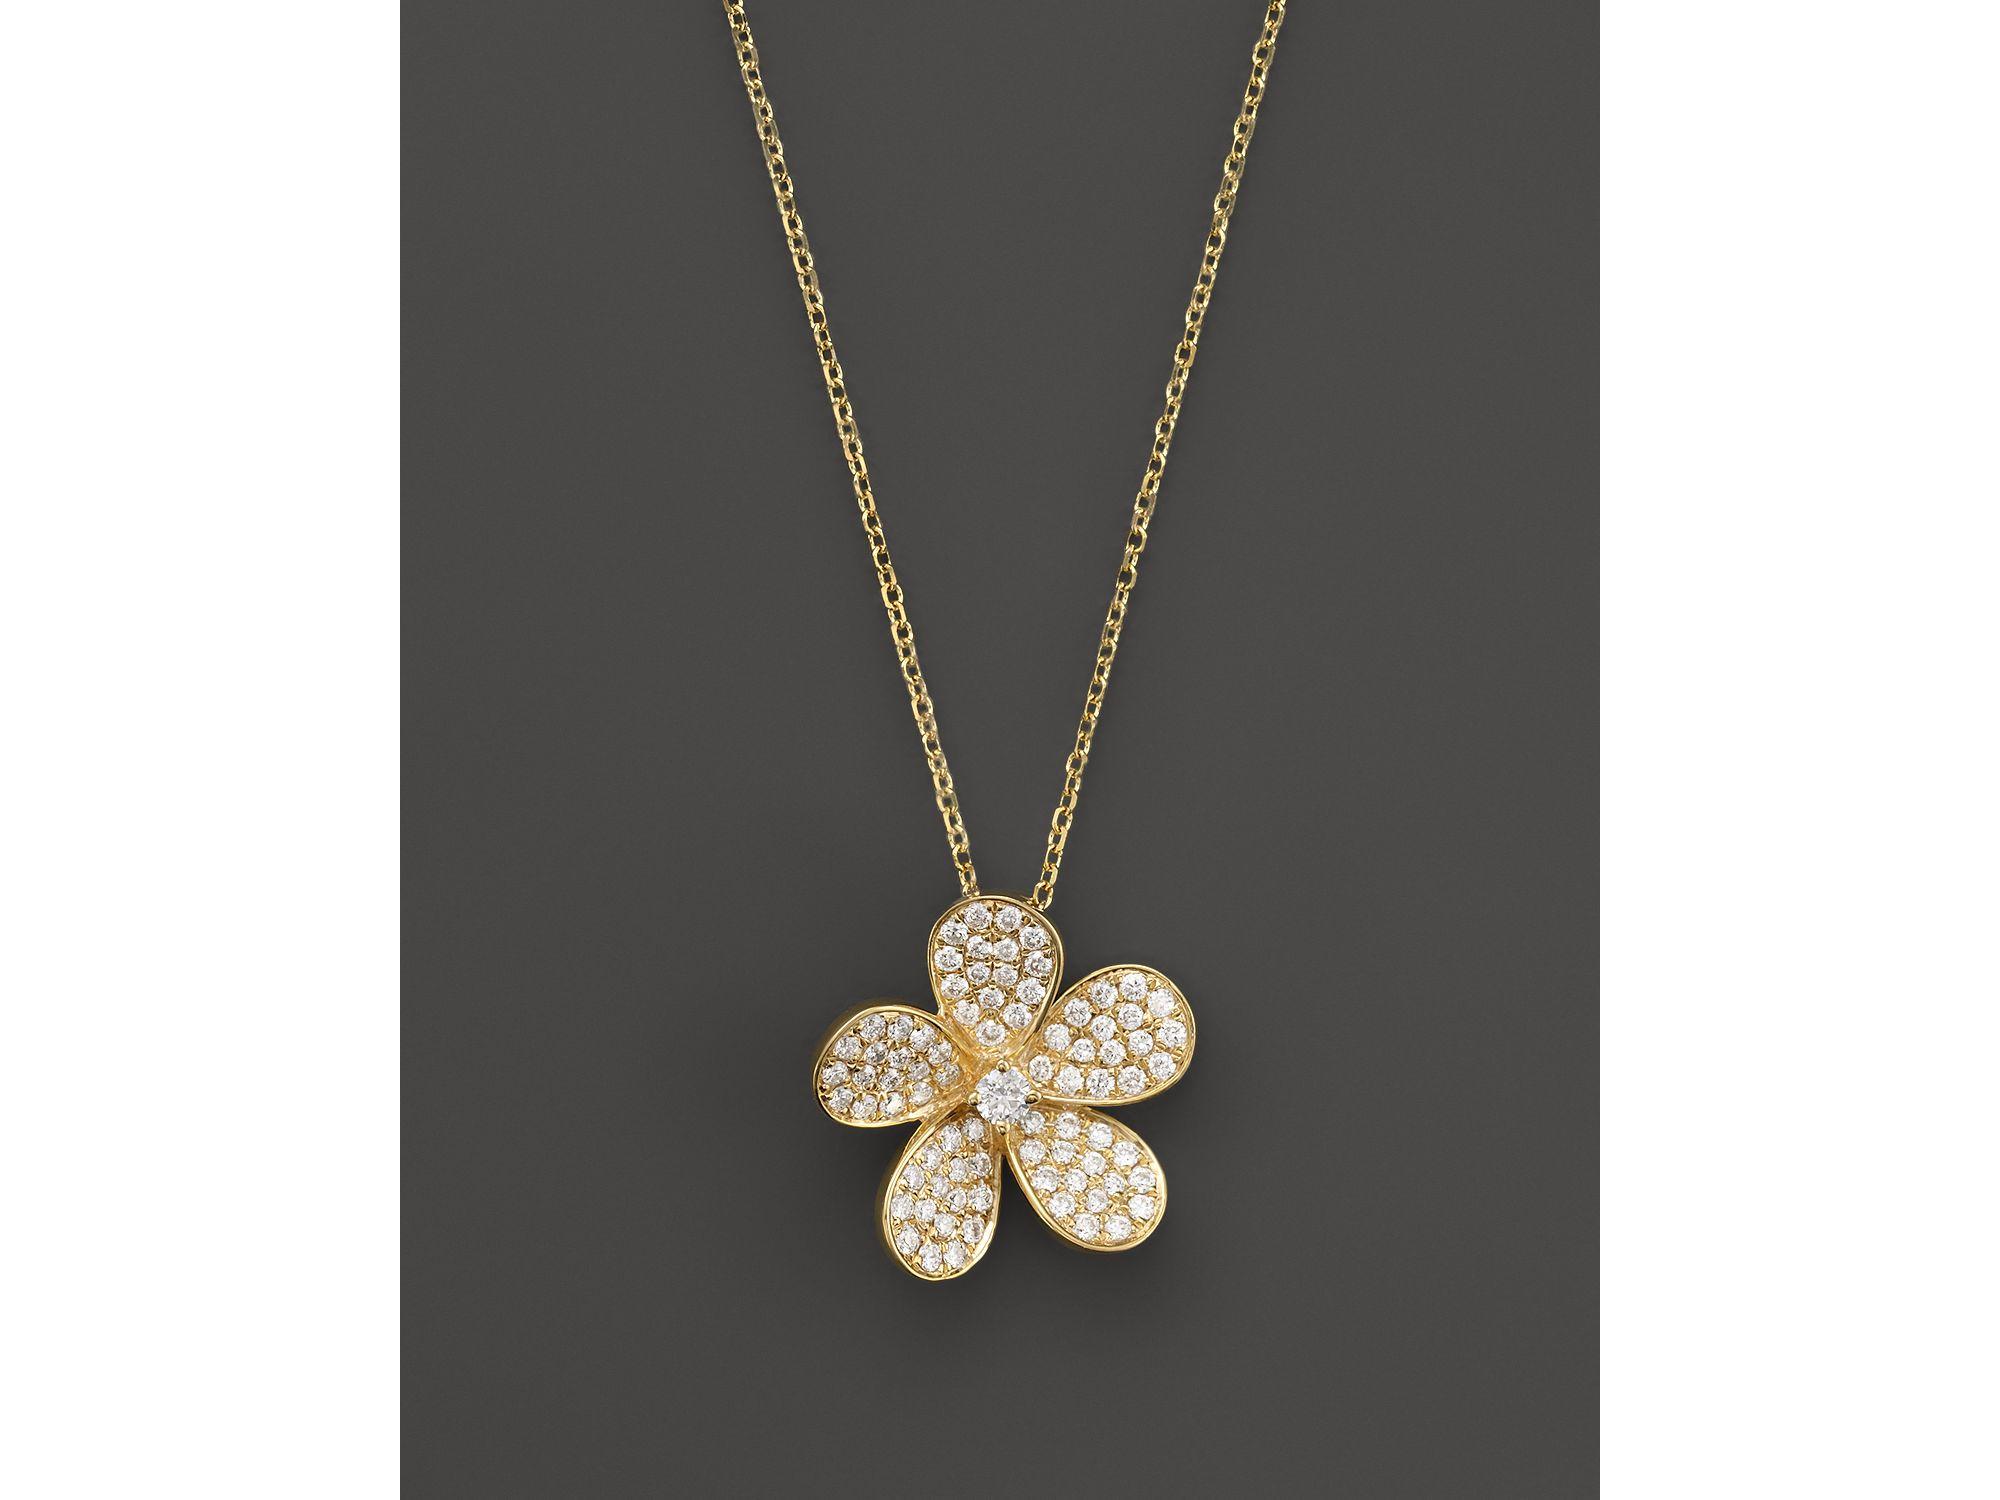 Kc Designs Diamond Flower Pendant Necklace In 14k Yellow